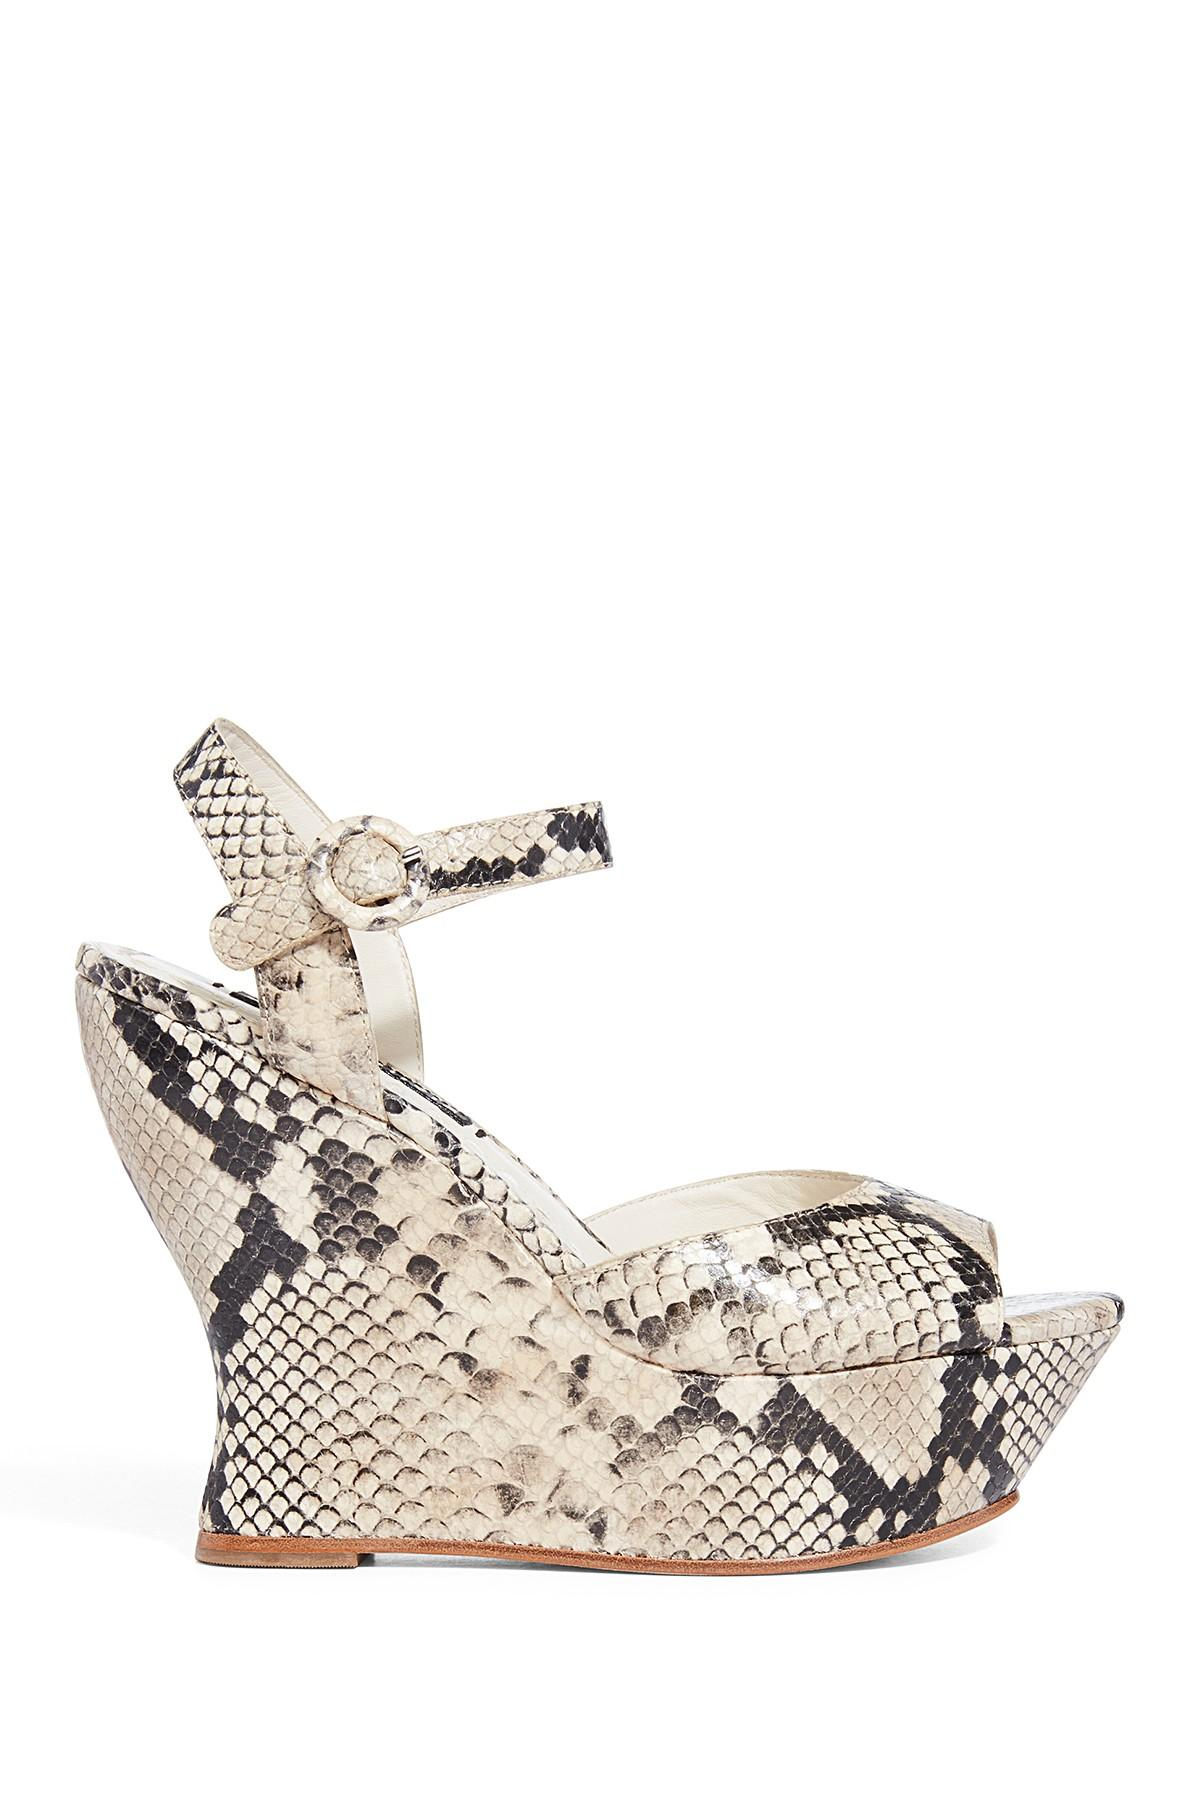 86659064b6ce Lyst - Alice + Olivia Jana Snake Patterned Wedge Sandal in Natural ...